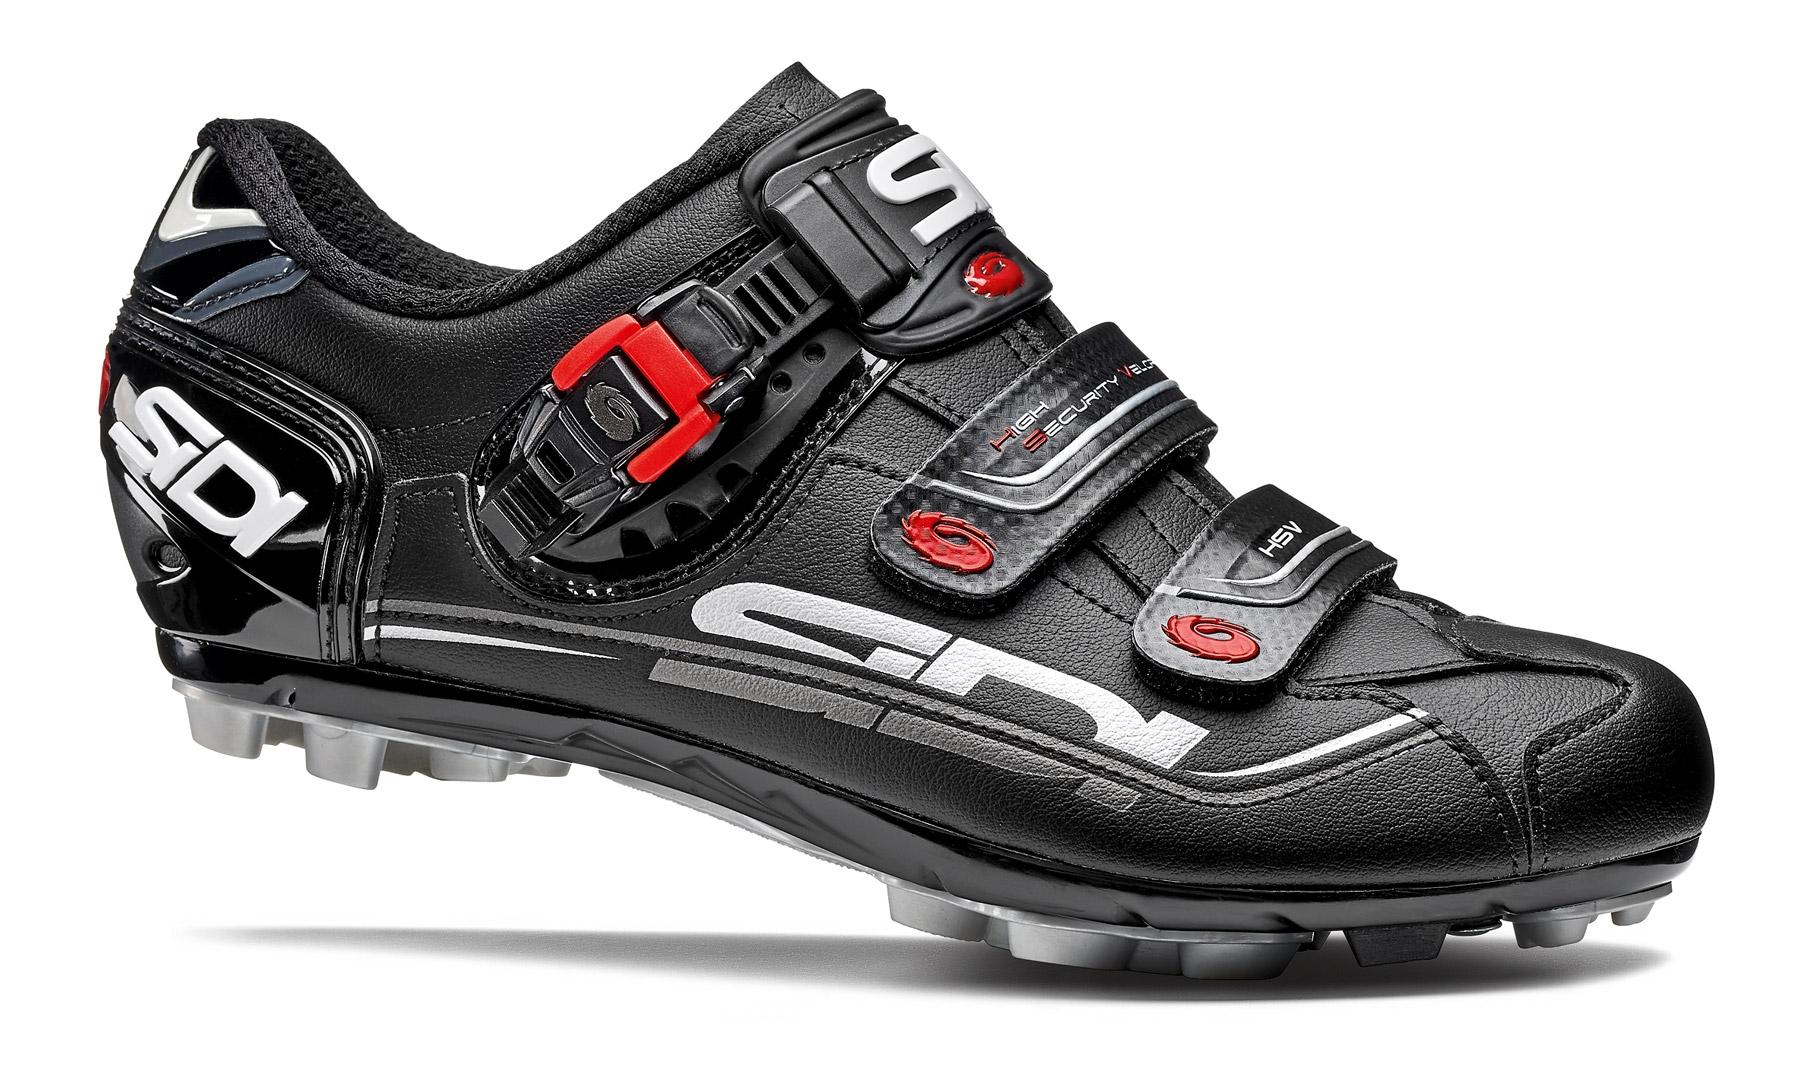 Sidi Dominator 7 MTB Shoes